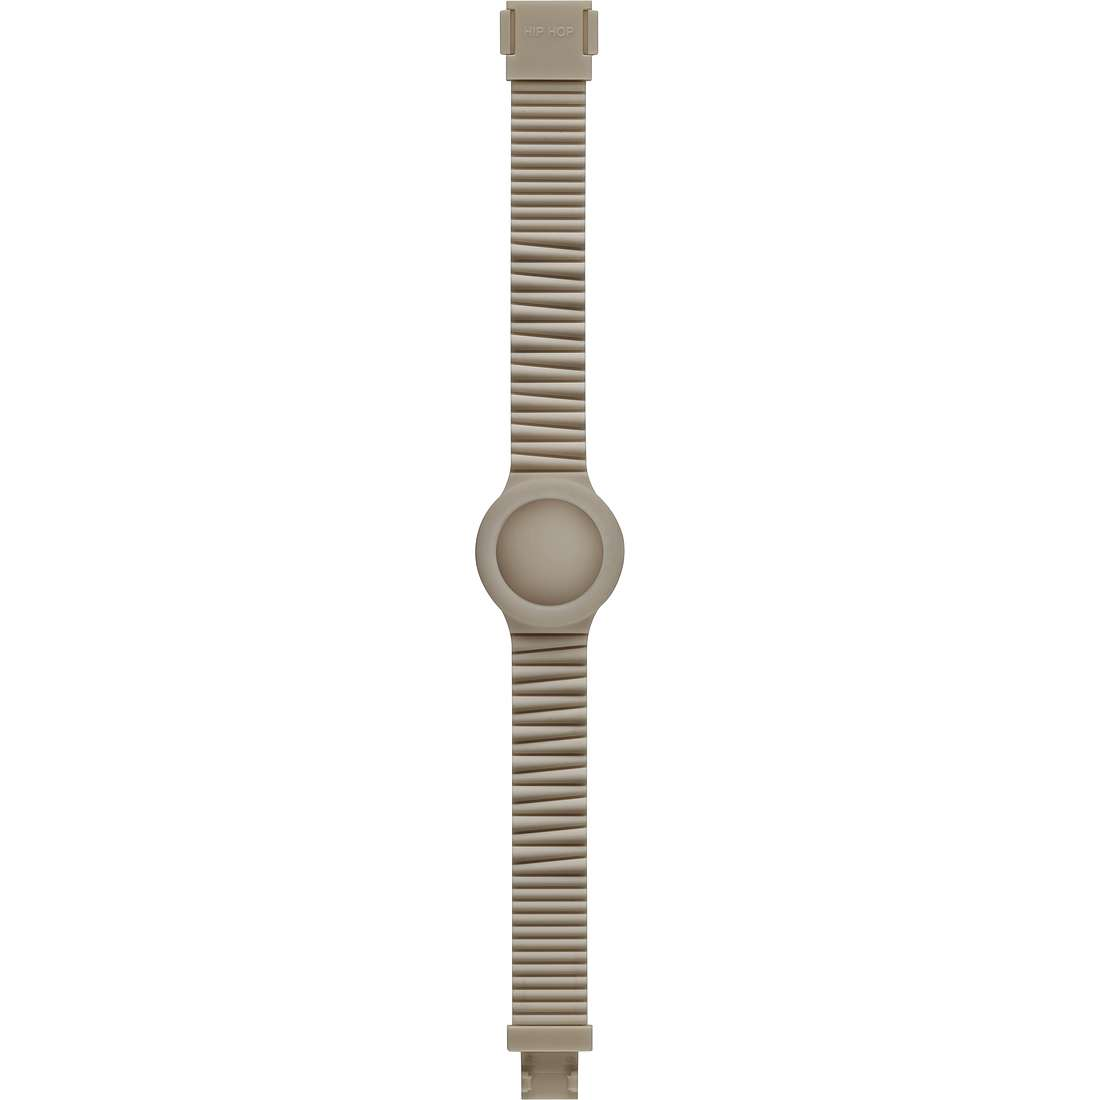 orologio accessorio donna Hip Hop Sensoriality HBU0512